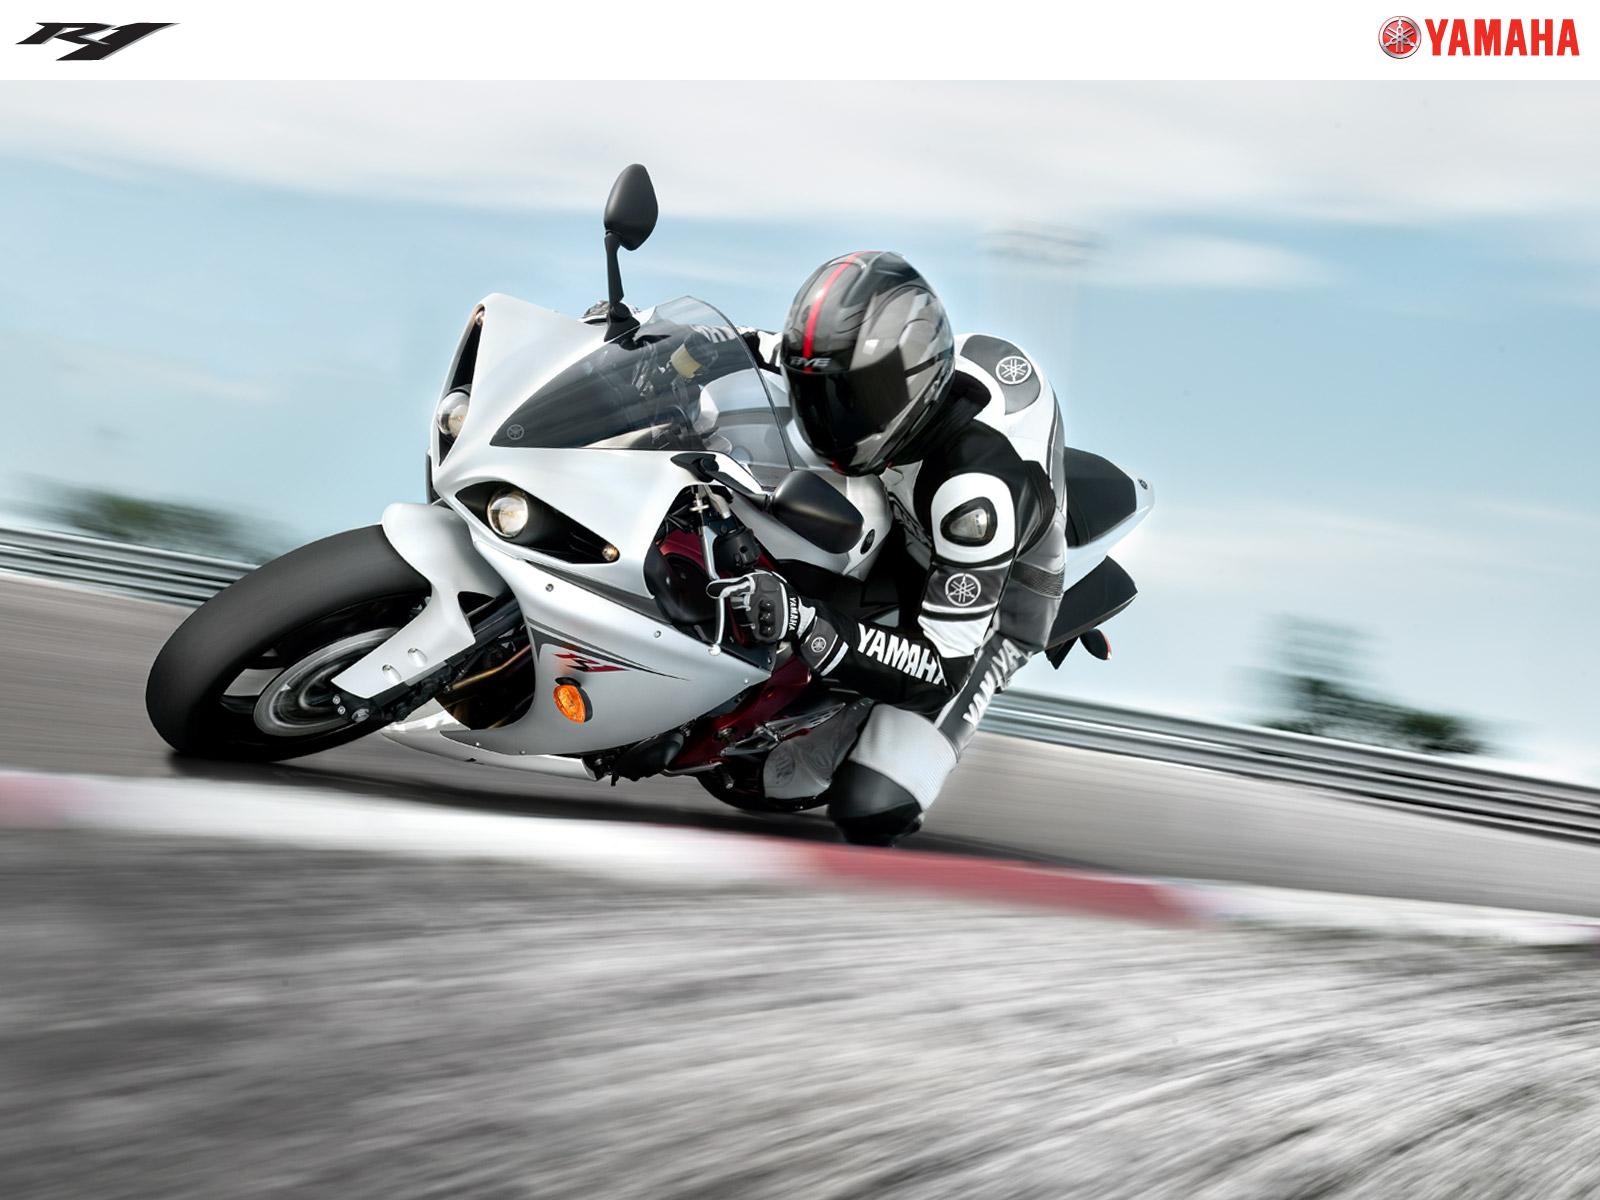 2009 Yamaha YZF R1 Wallpapers HD Wallpapers 1600x1200